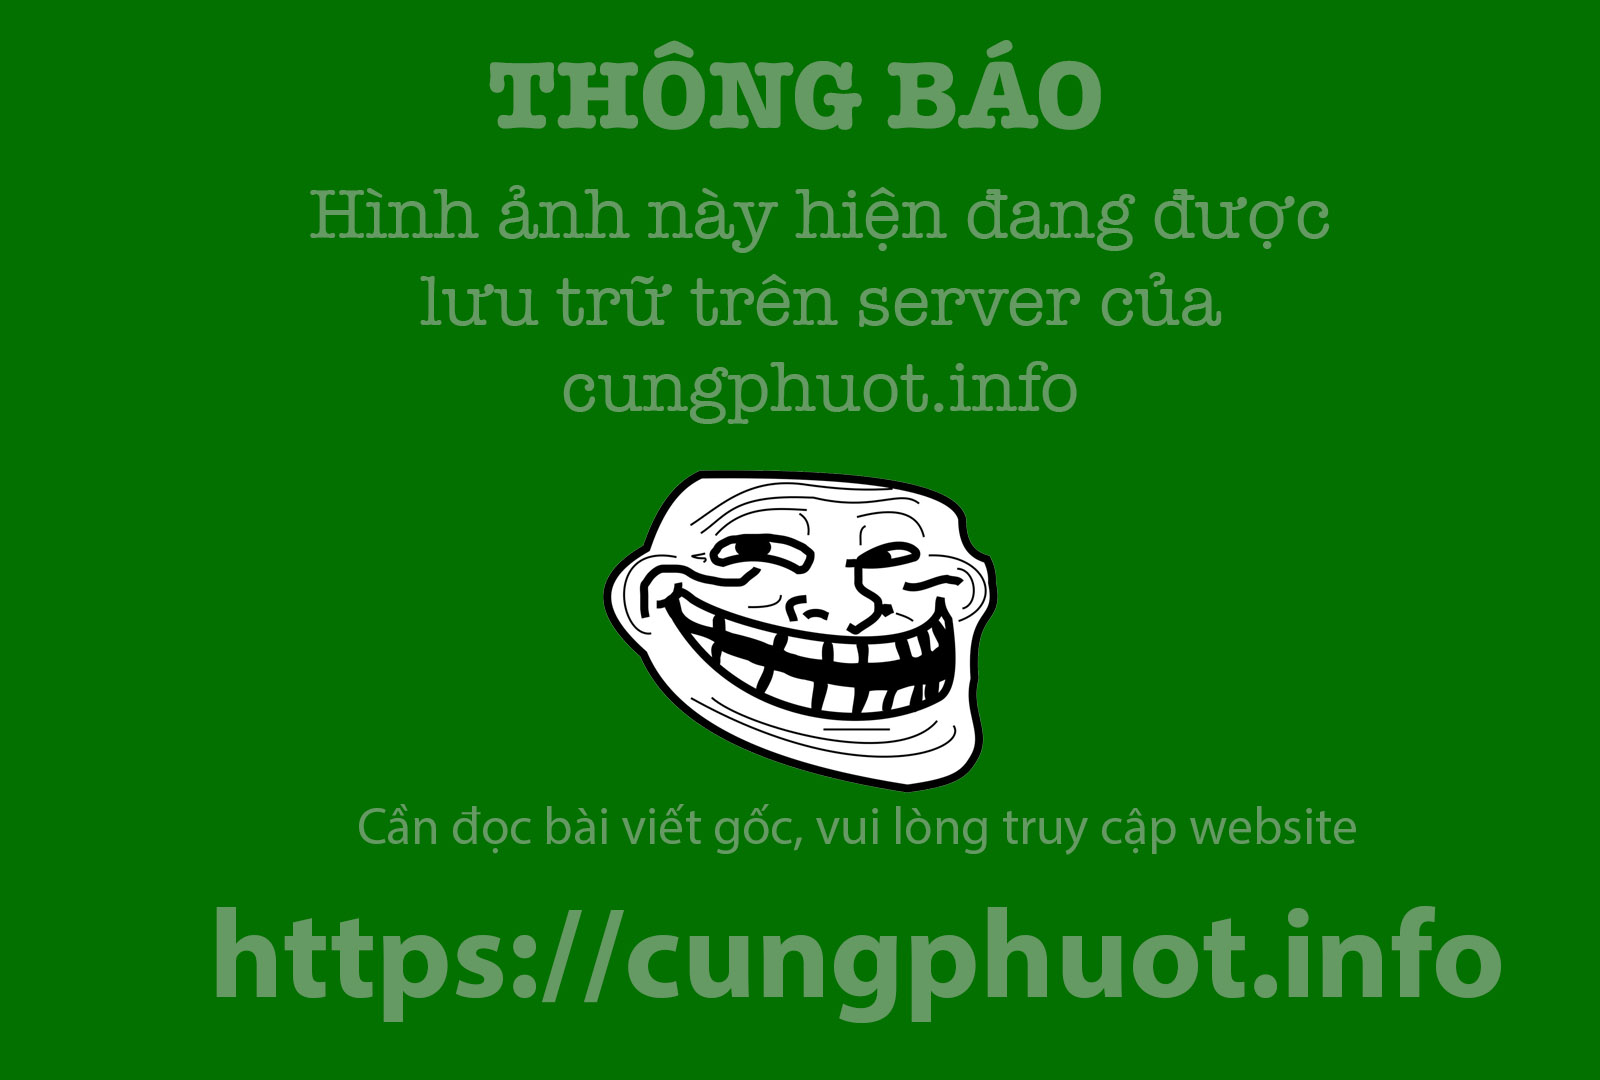 Dan phuot me man ve dep ky vi cua hang Prai o Quang Tri hinh anh 10